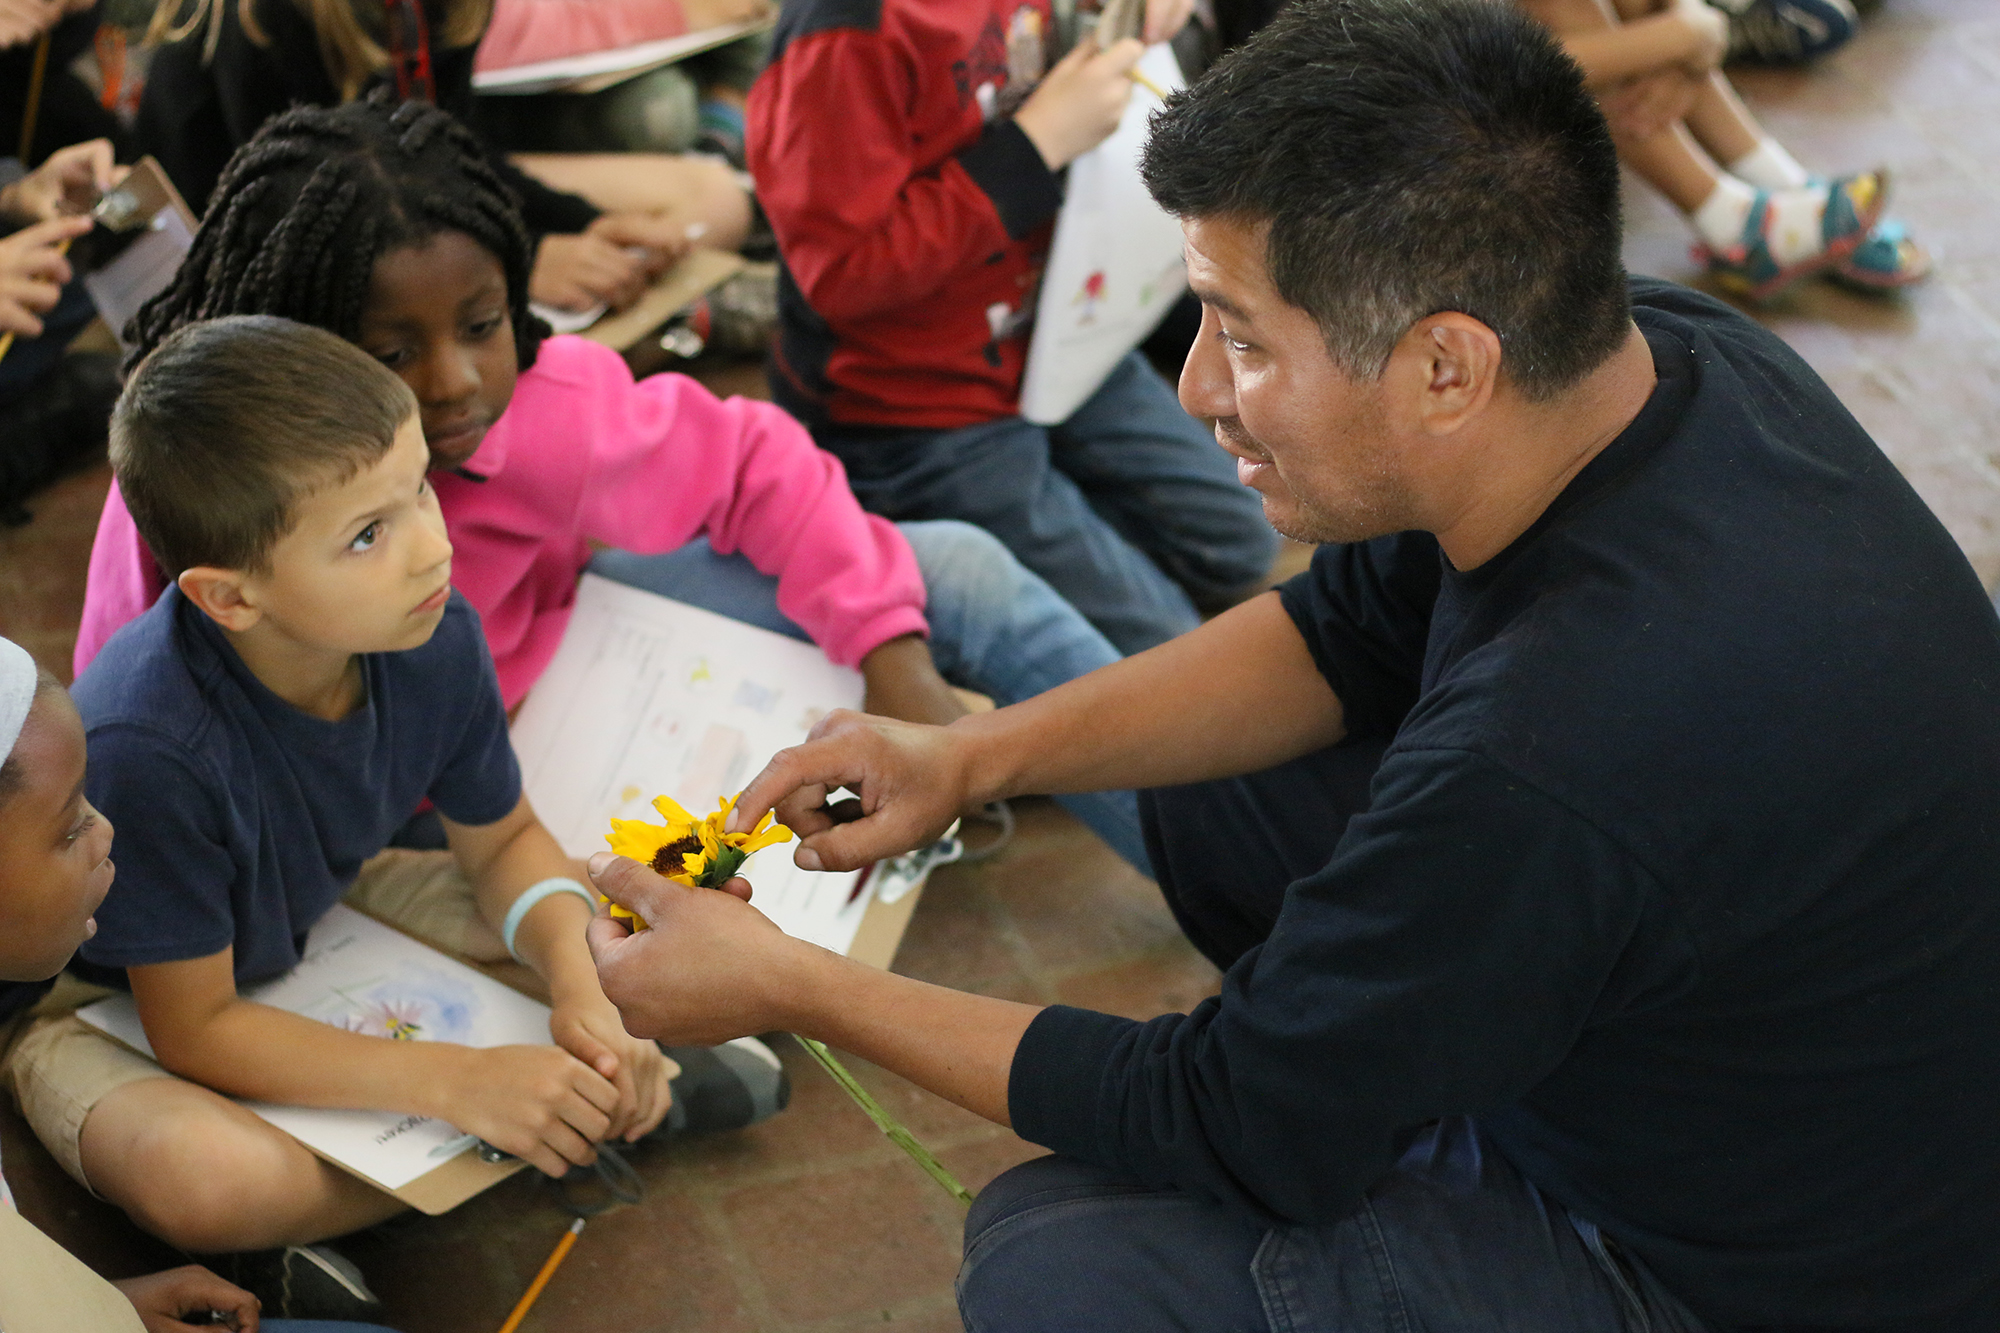 Luis Marmol teaching with sunflower